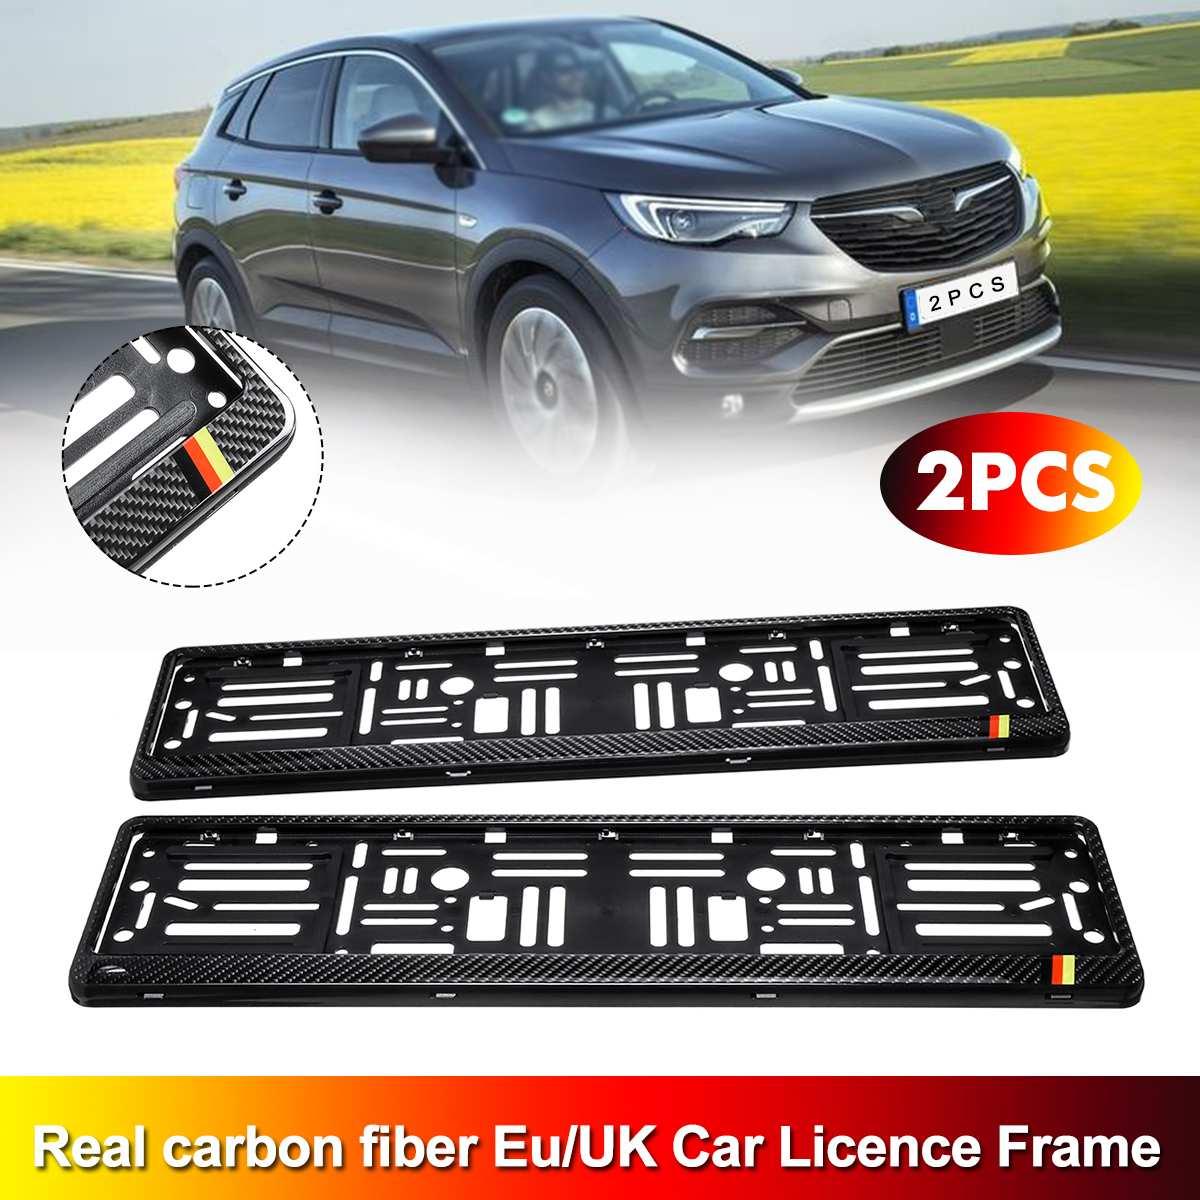 Fitment Automotive General 2PCS Real Carbon Fiber Licence Number Plate Surround Holder Frame Automotive General Car Decorate